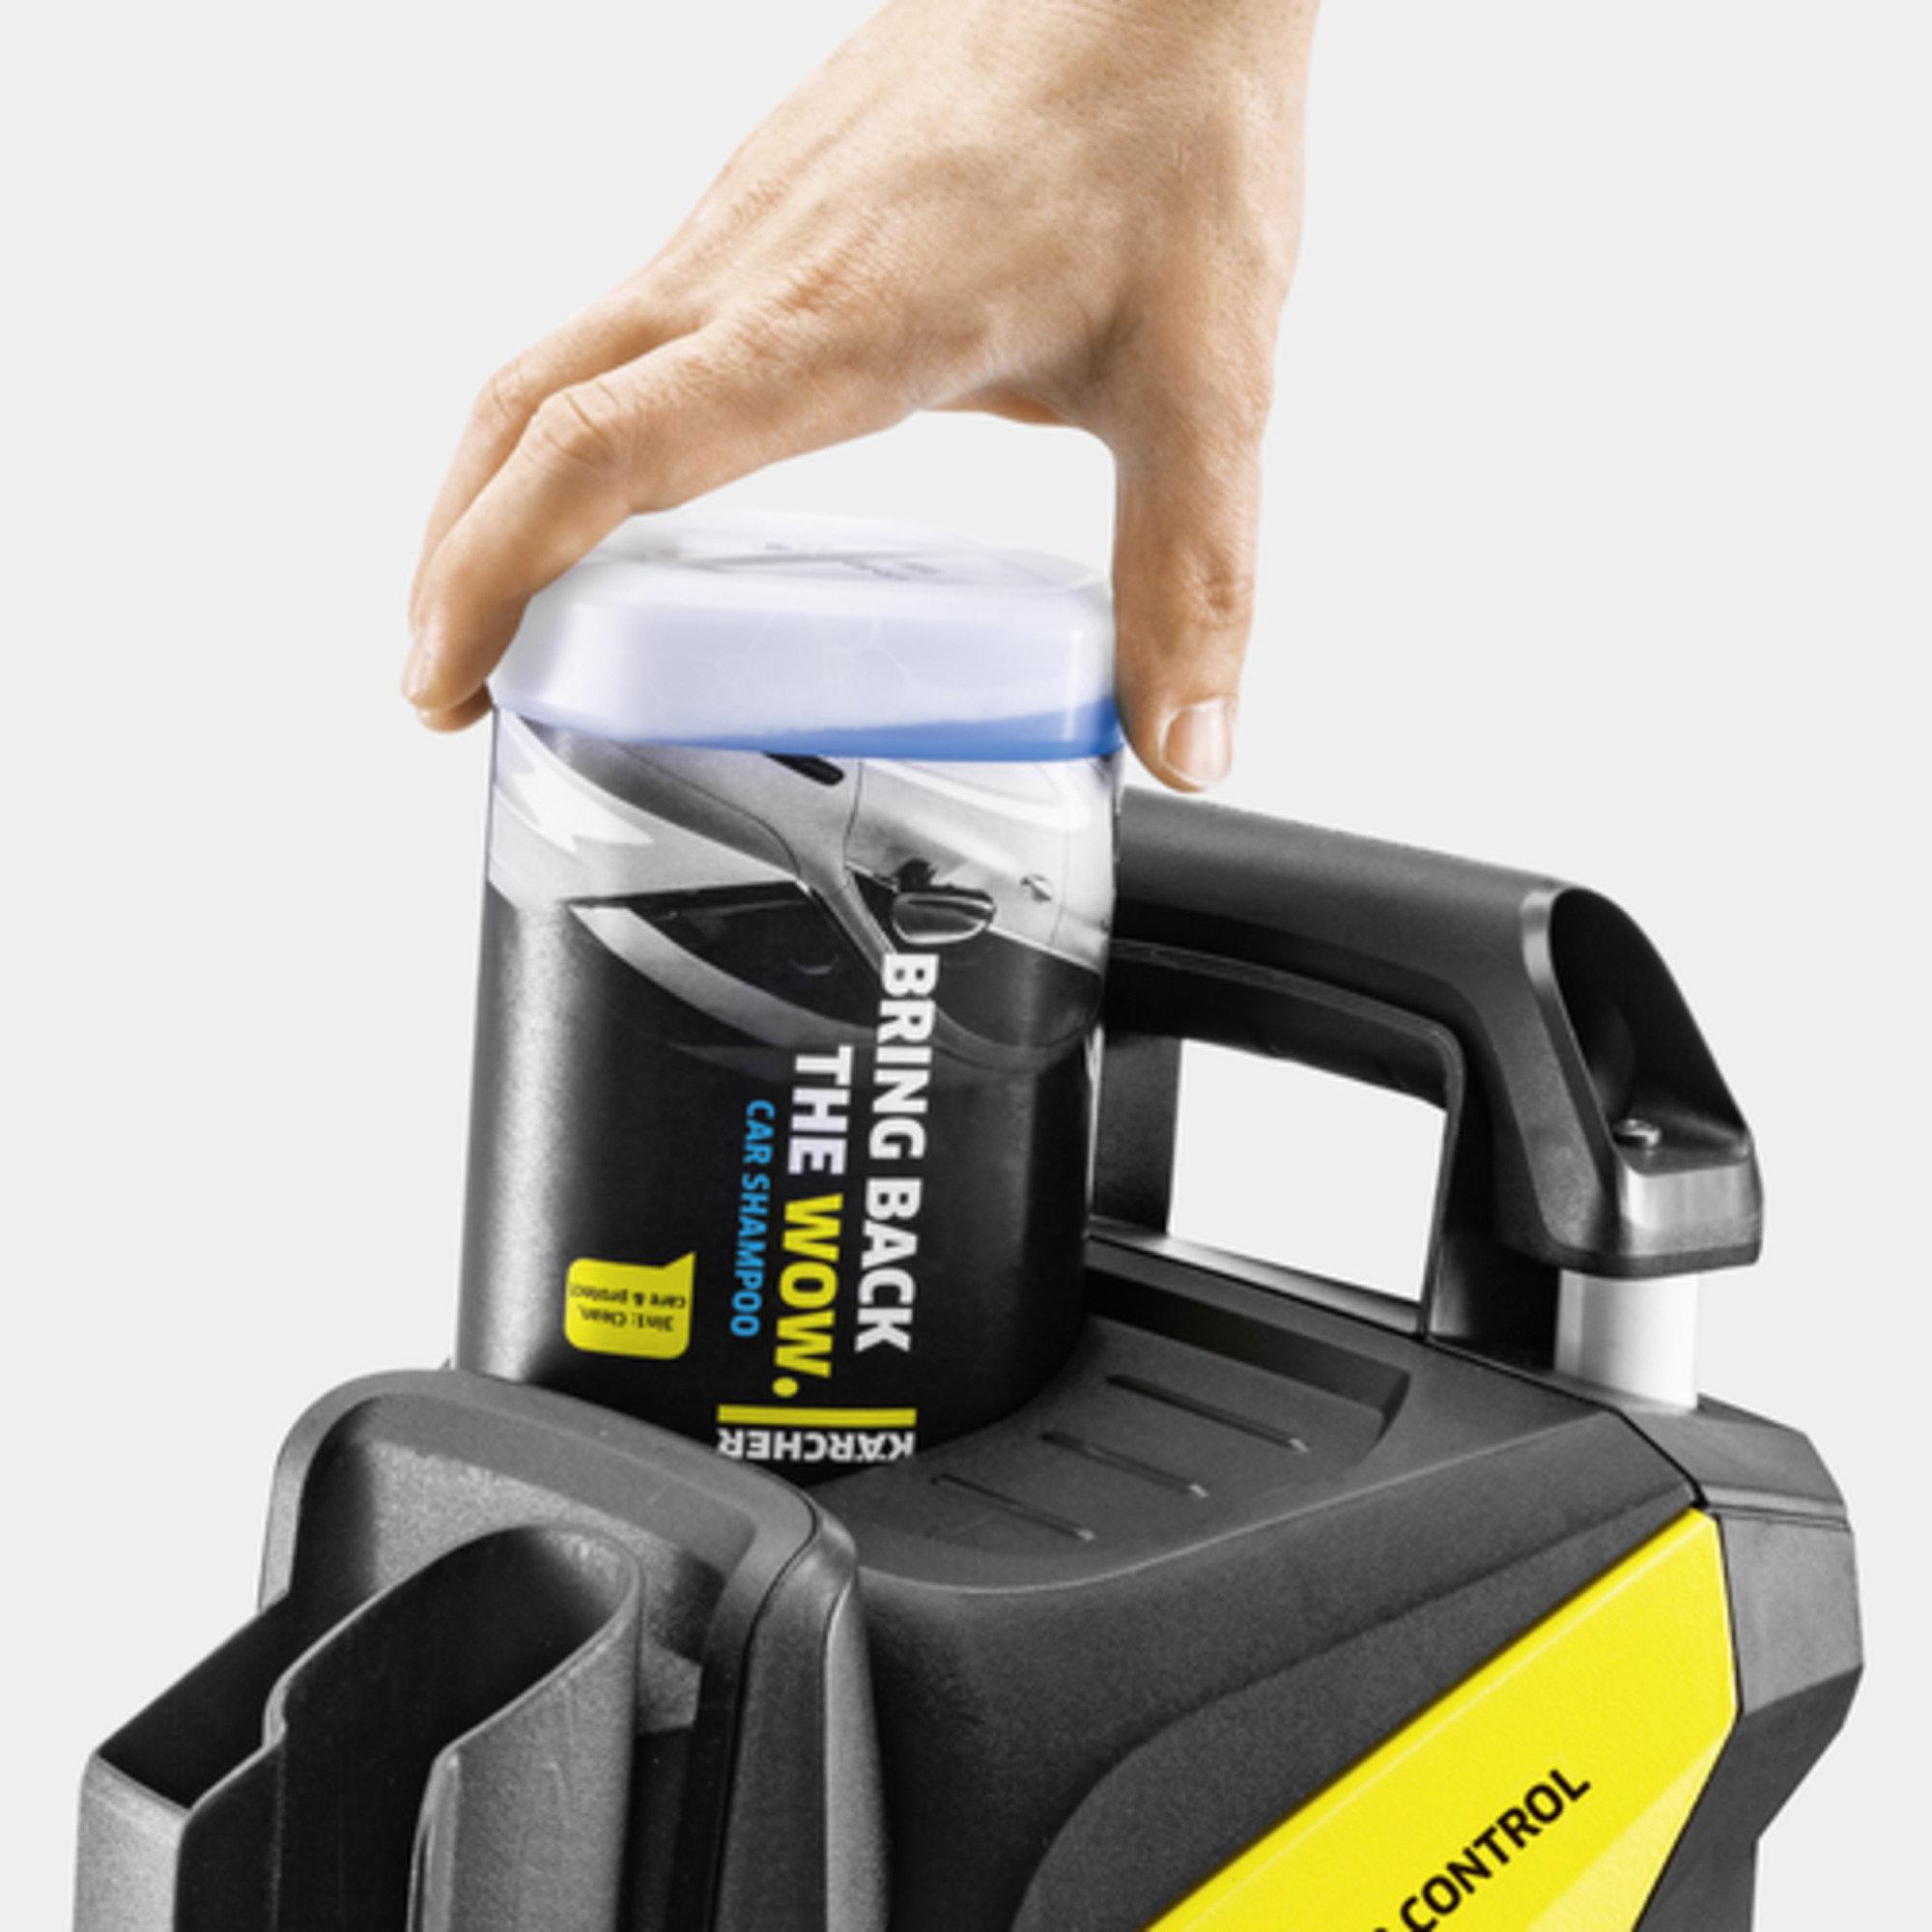 High pressure washer K 5 Power Control: Plug 'n' Clean – the Kärcher detergent system